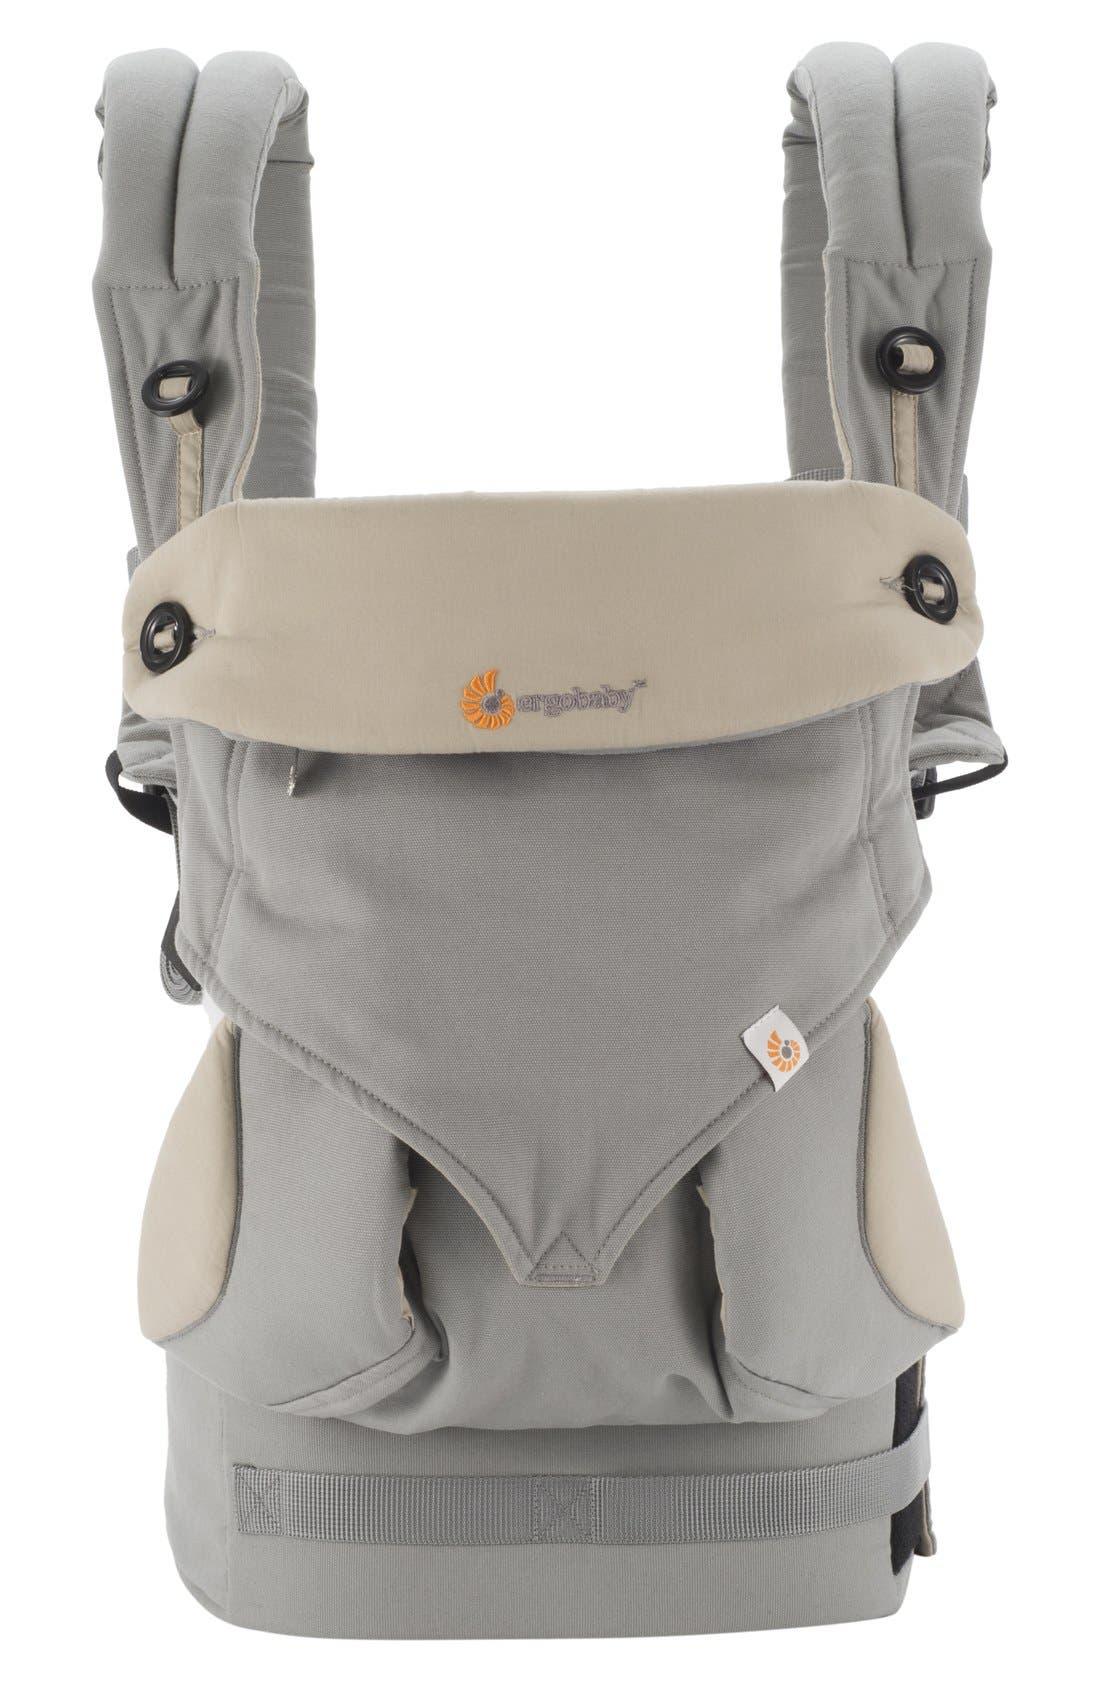 Main Image - ERGObaby '360' Baby Carrier